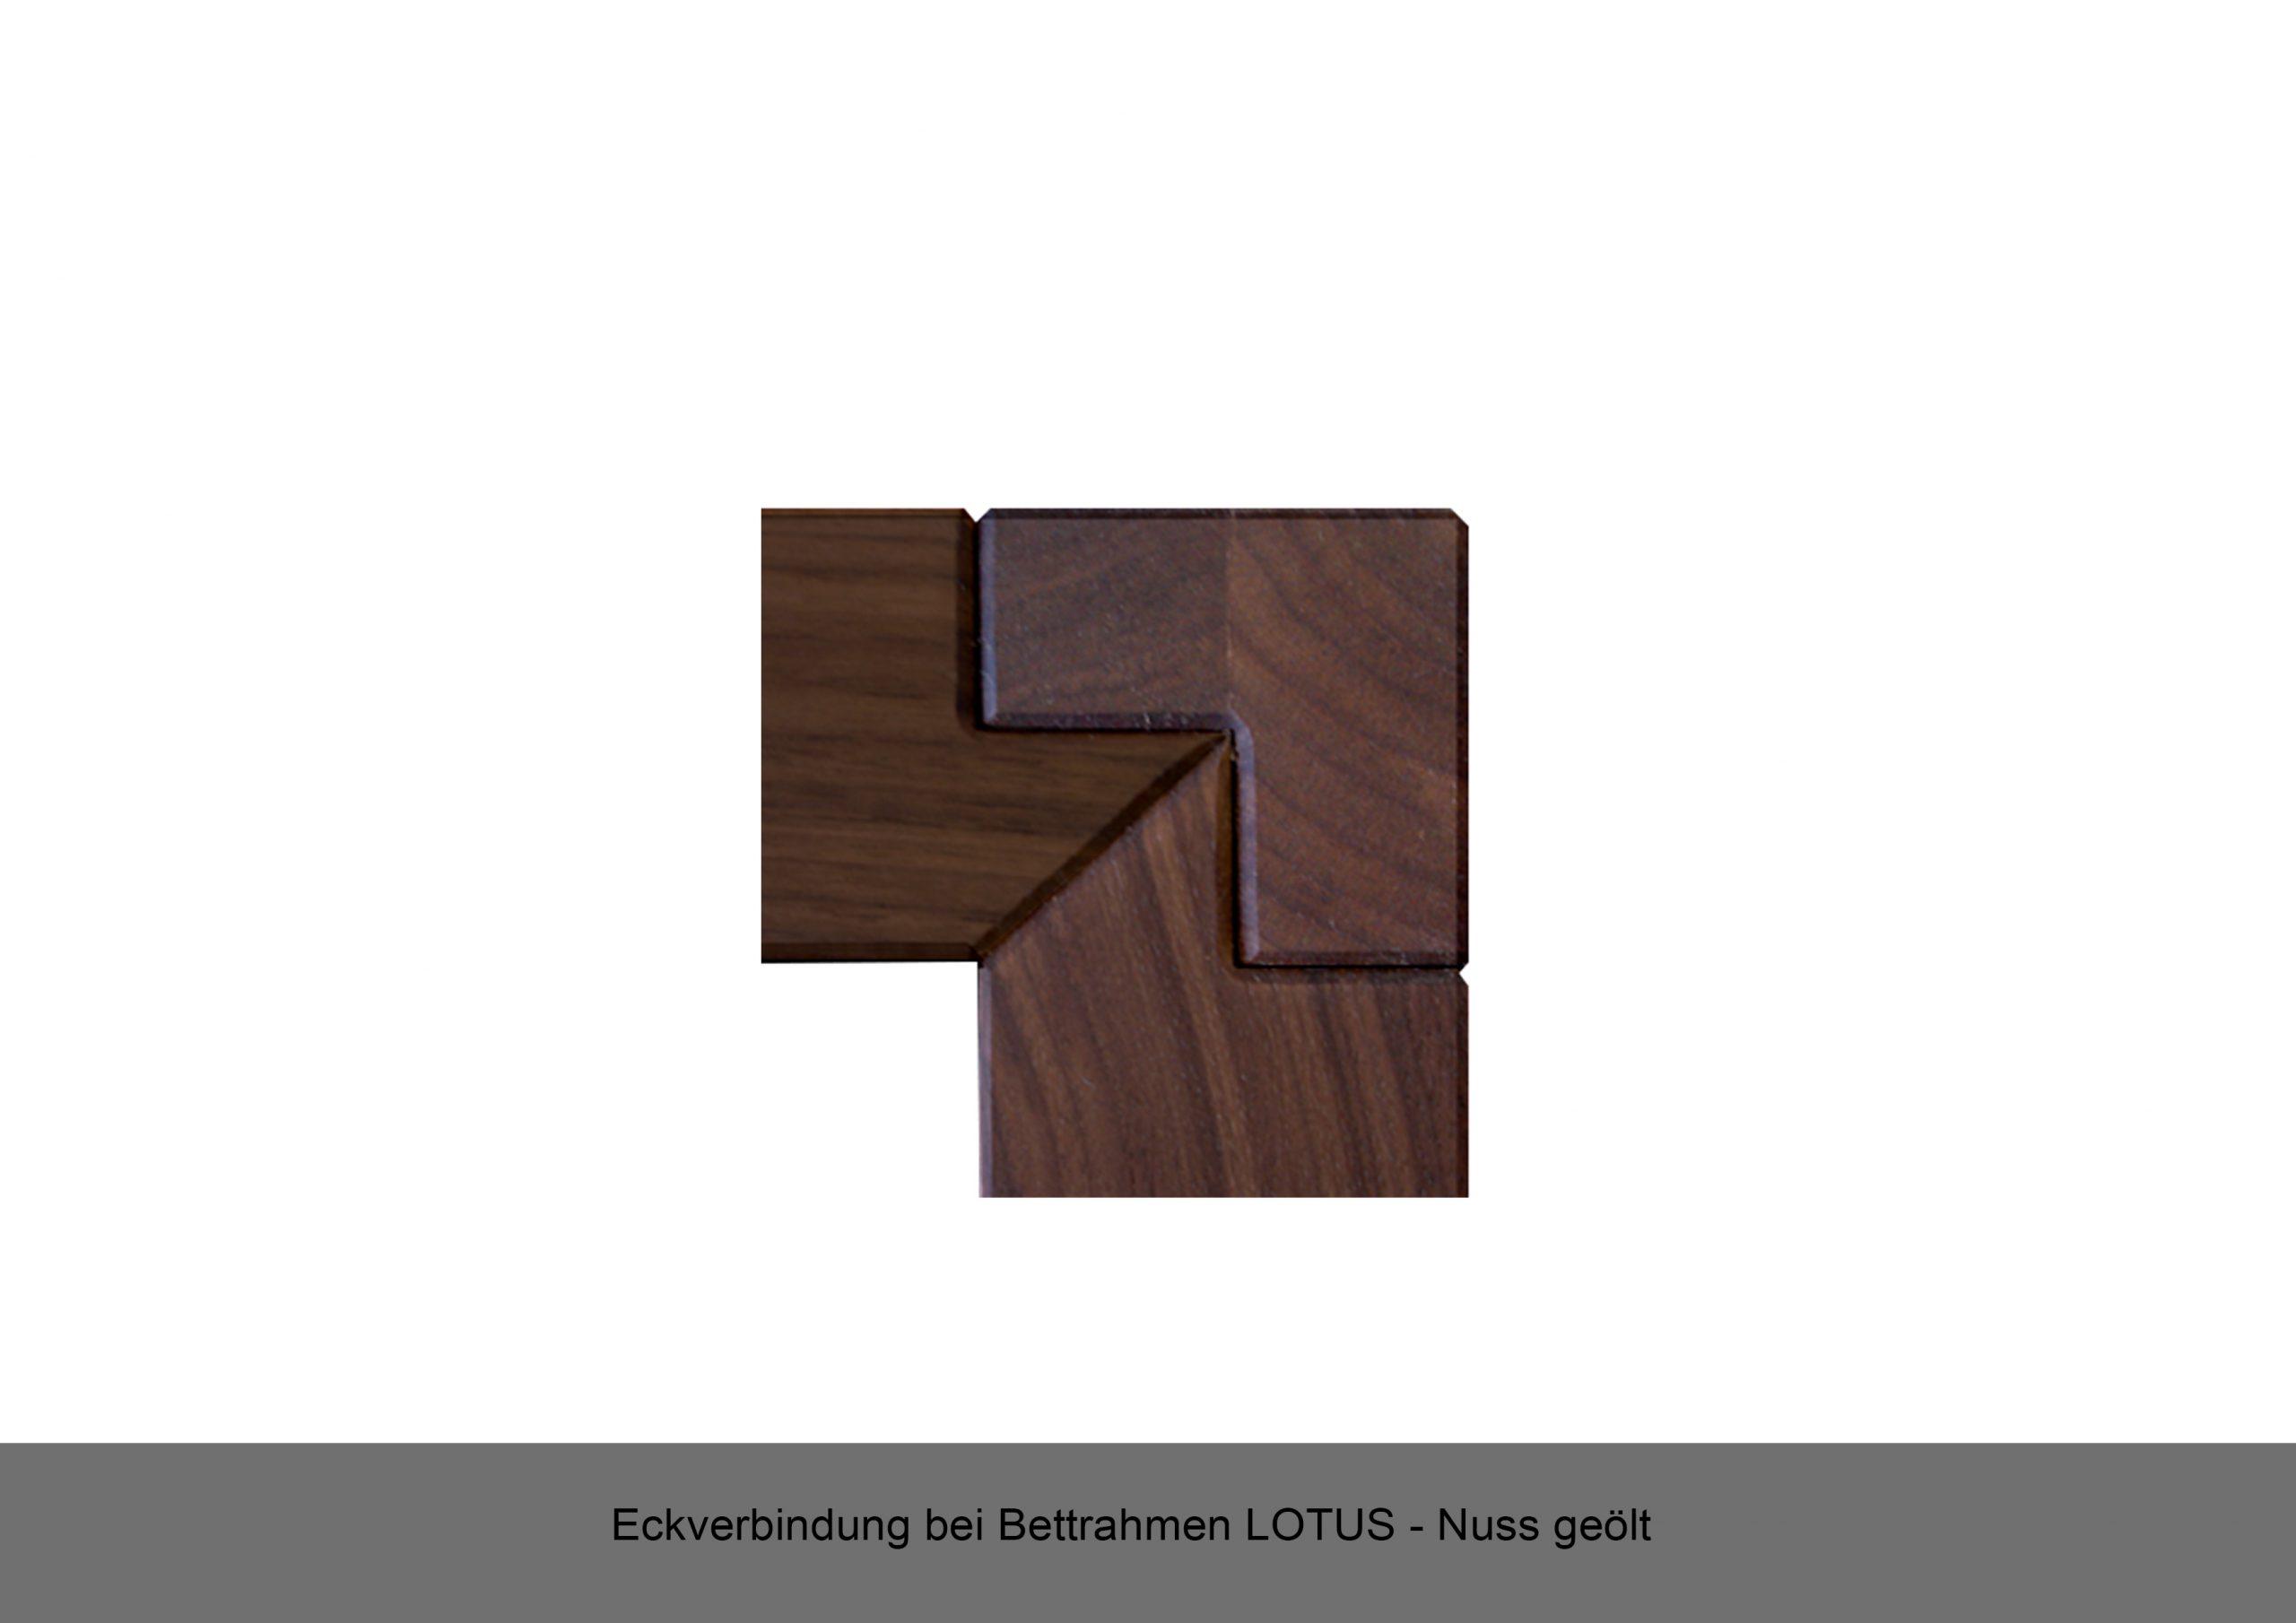 Eckverbindung Massivholzbett Bettrahmen LOTUS Nuss geölt